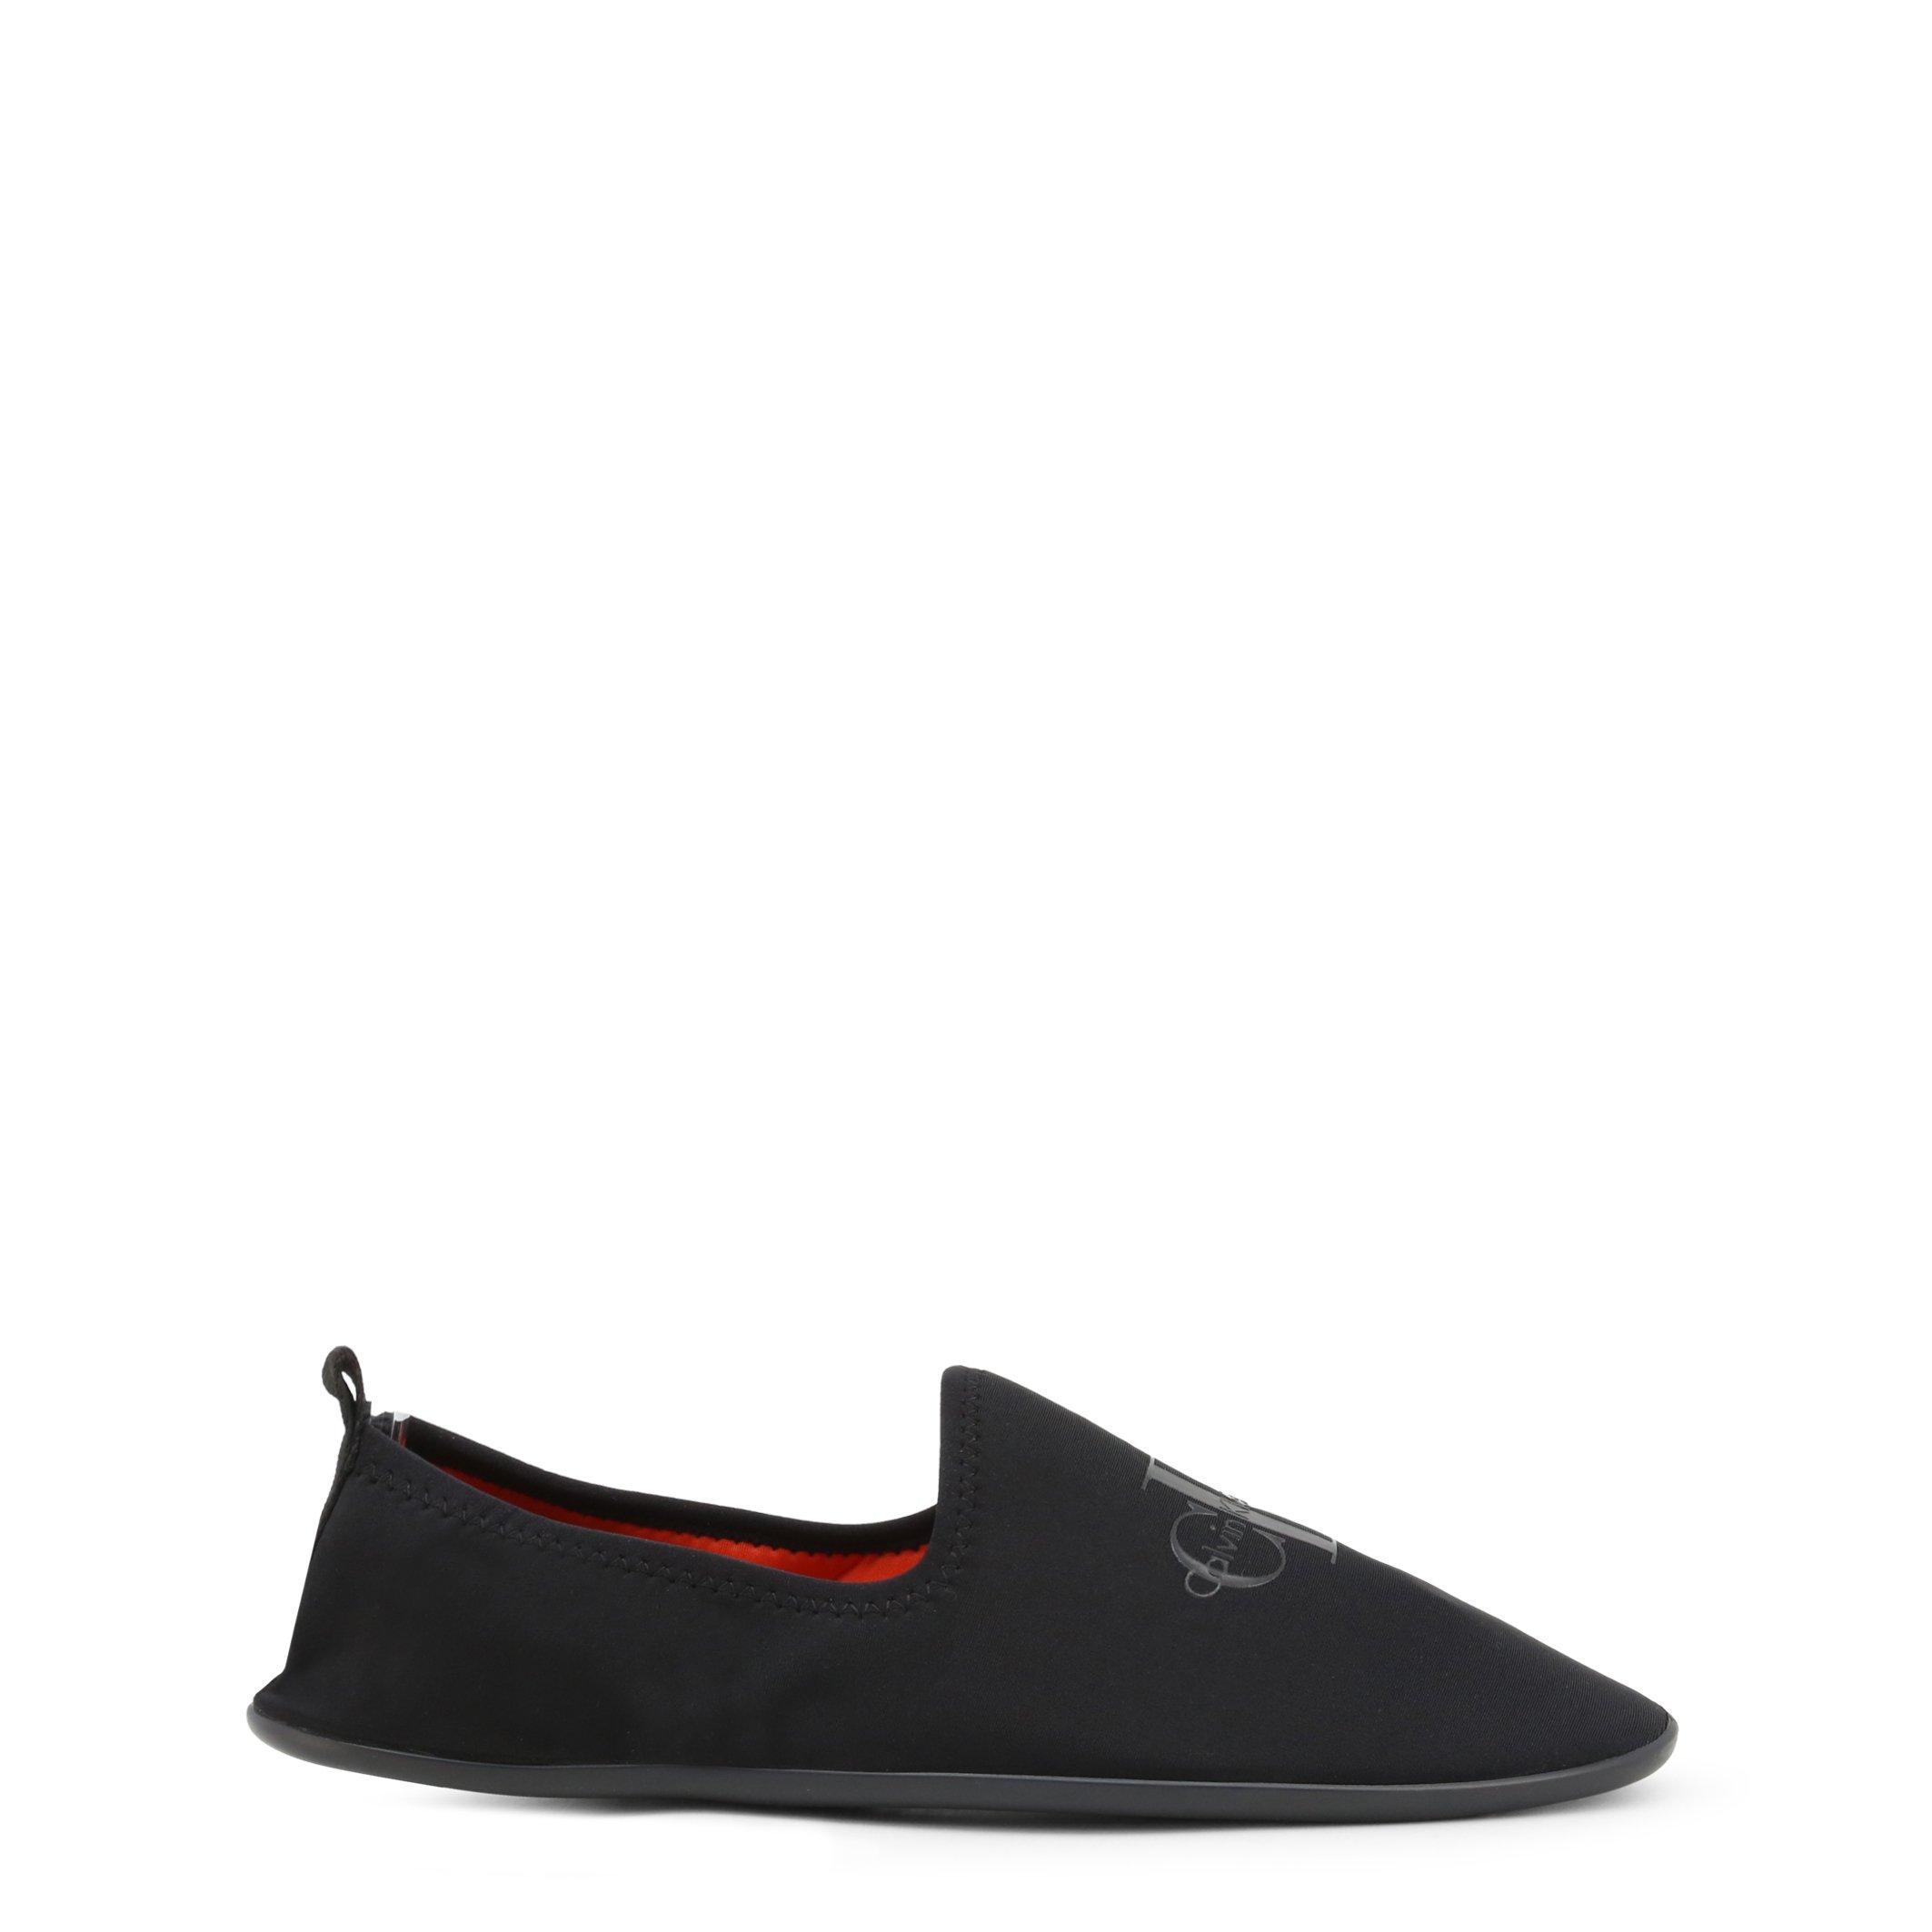 Calvin Klein Men's Slip on Shoe Blue TRAVIS_SE8566 - black L